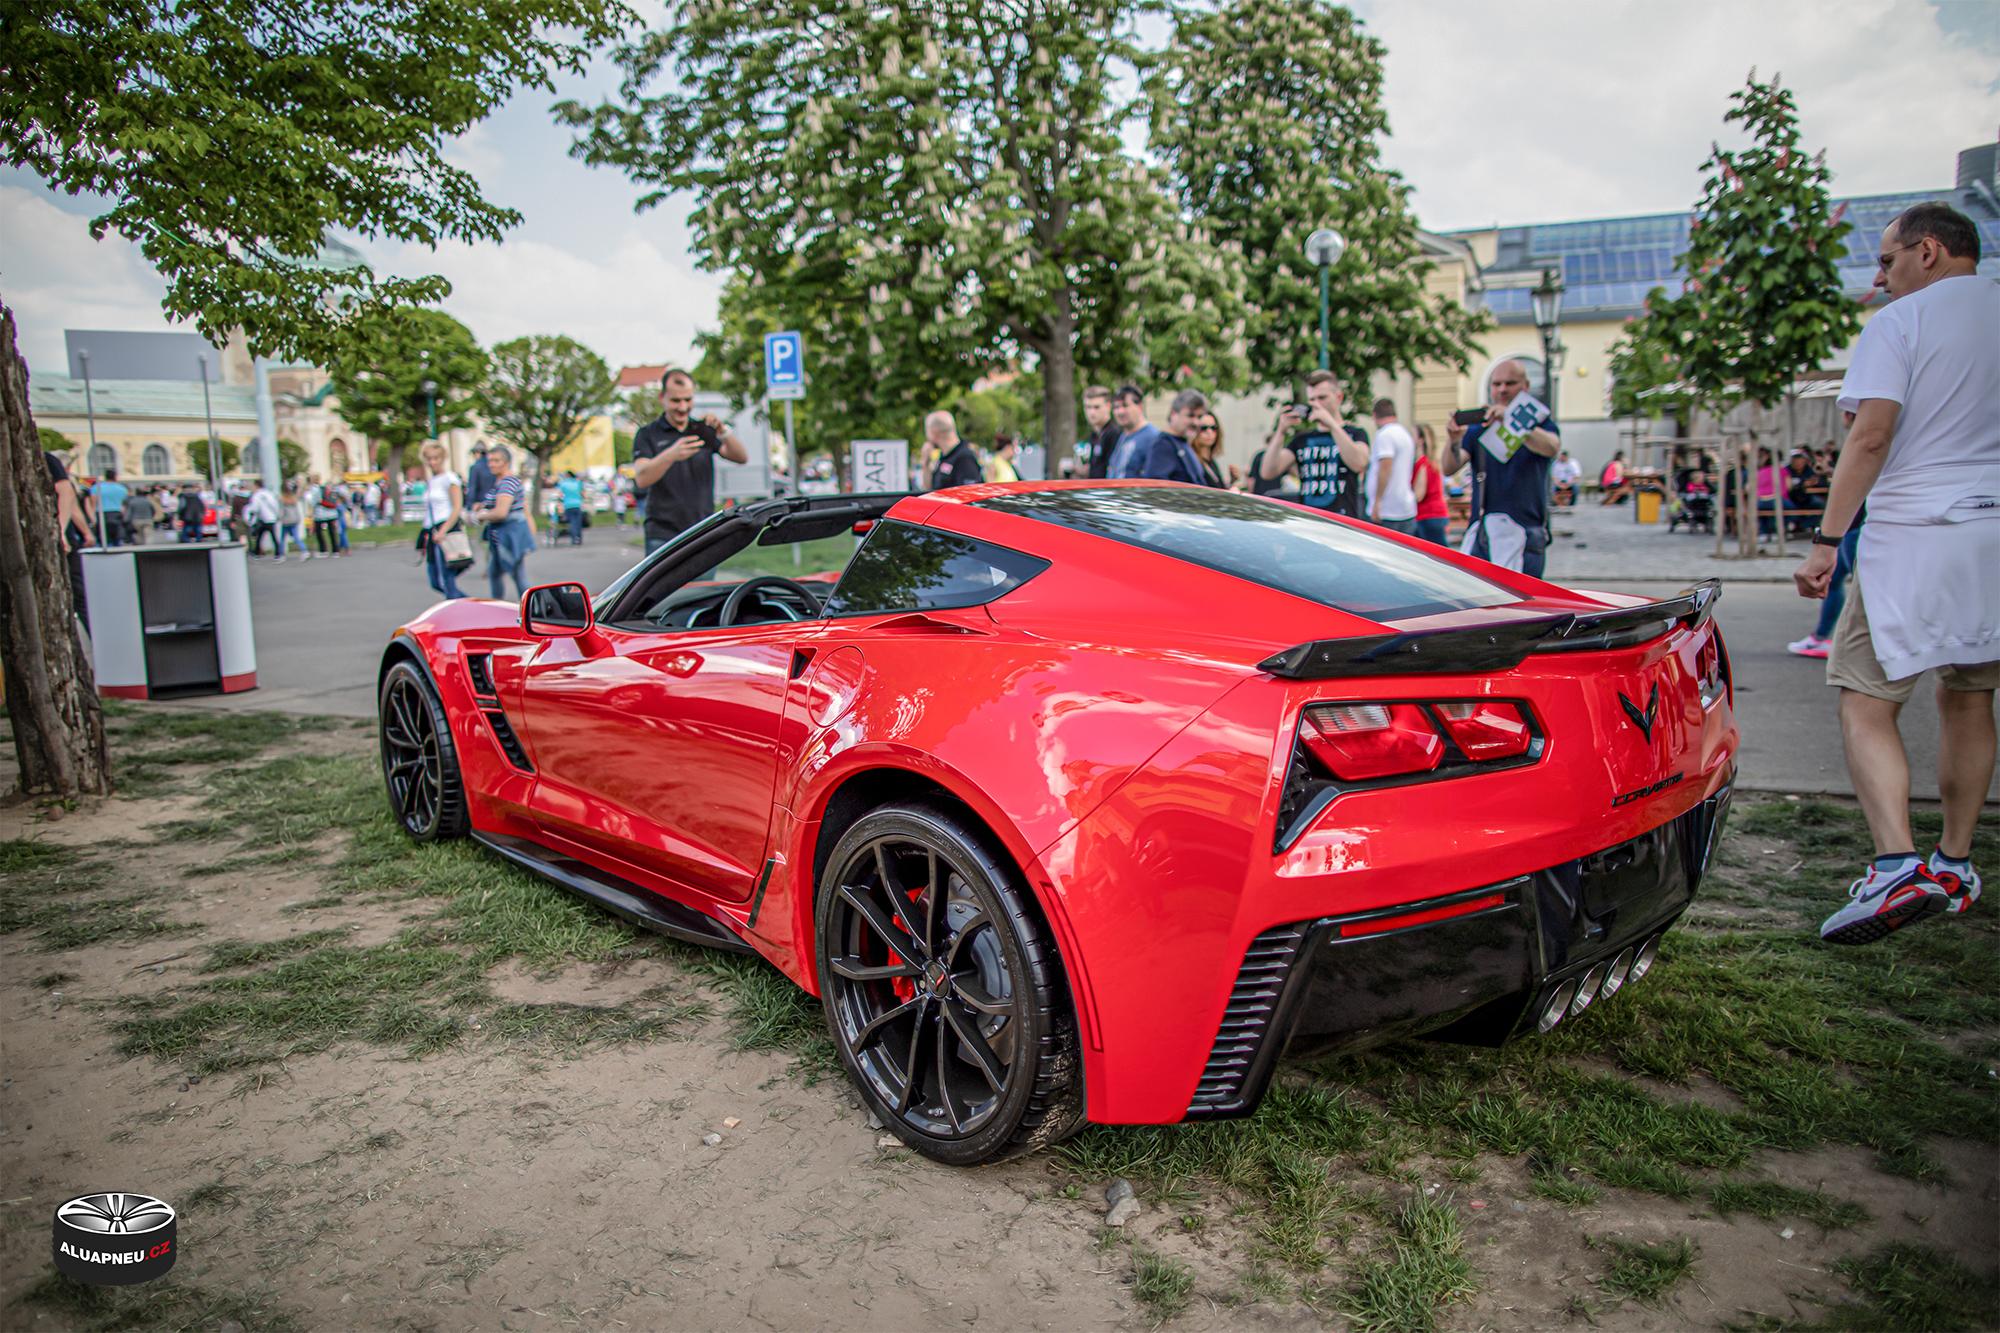 Černá alu kola Chevrolet Corvette - Automobilové Legendy 2019 - www.aluapneu.cz